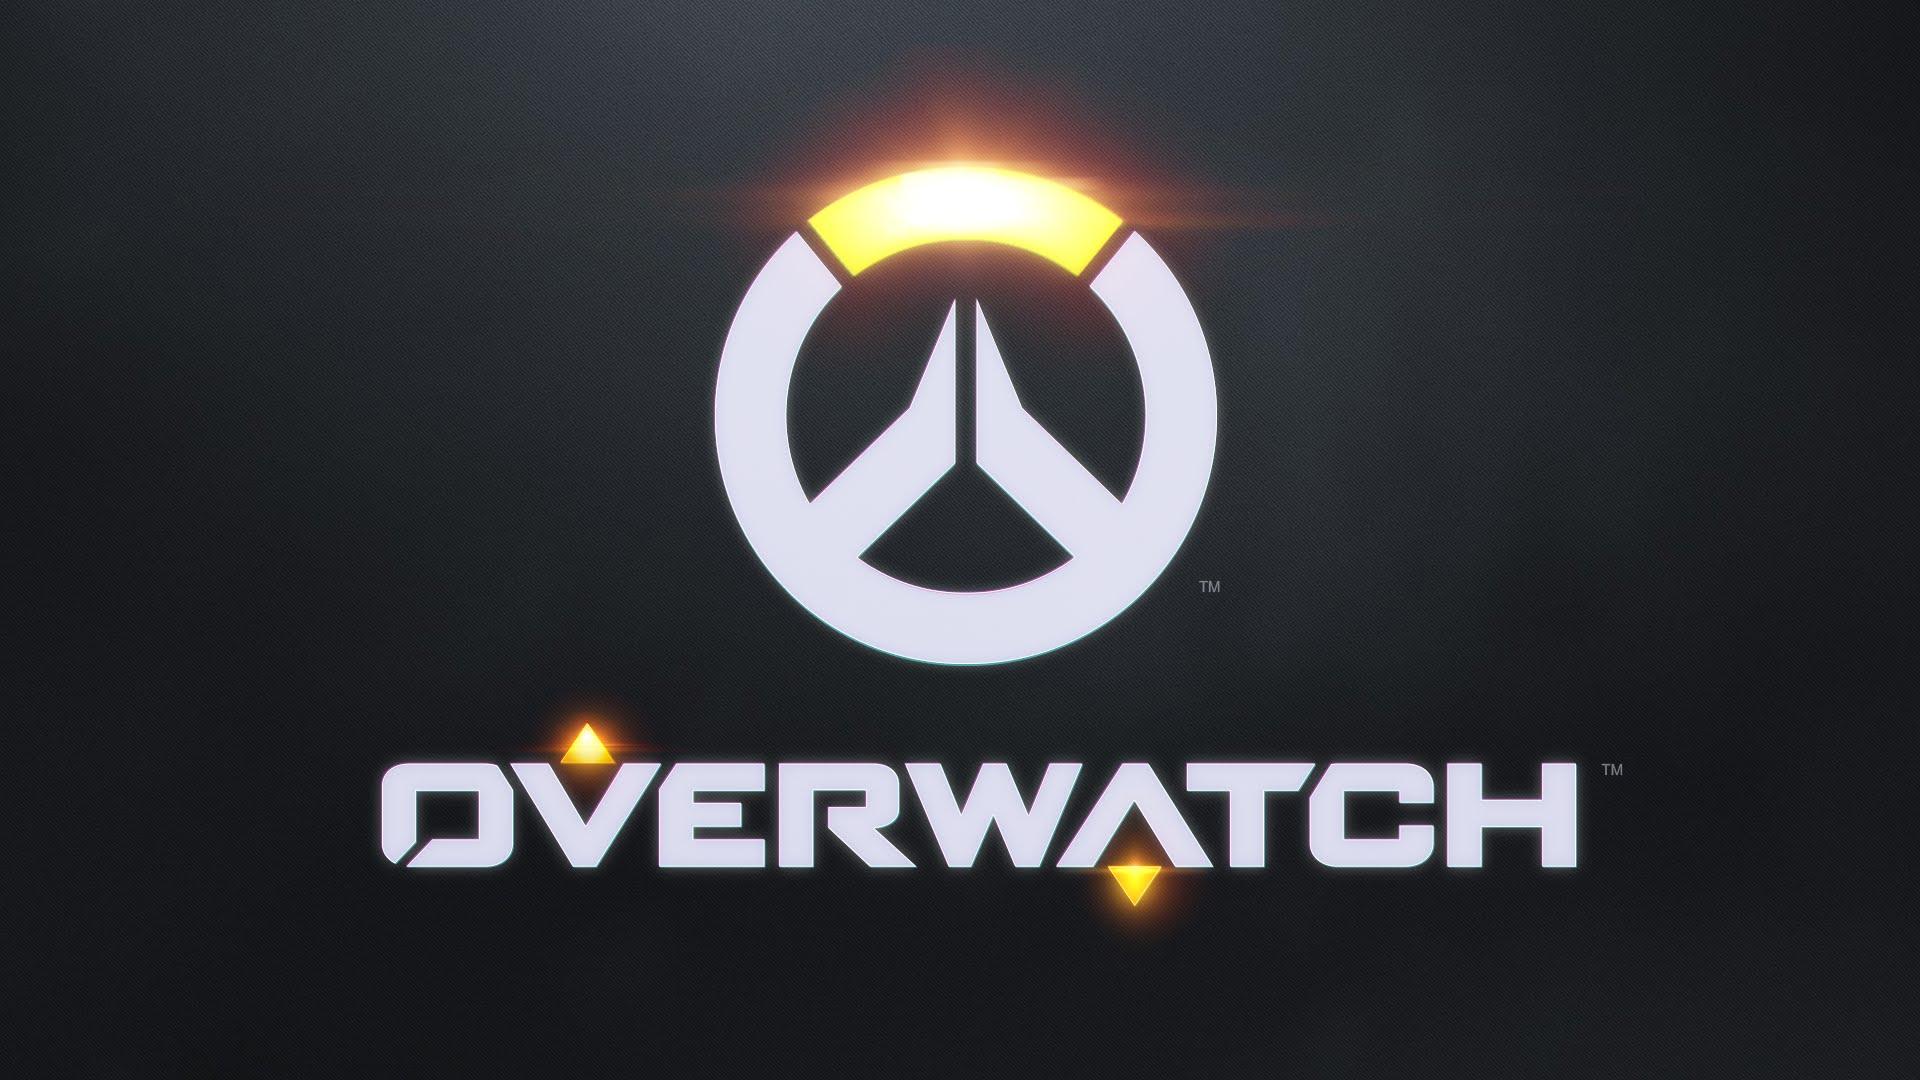 Overwatch entonne son hymne dans le dernier trailer